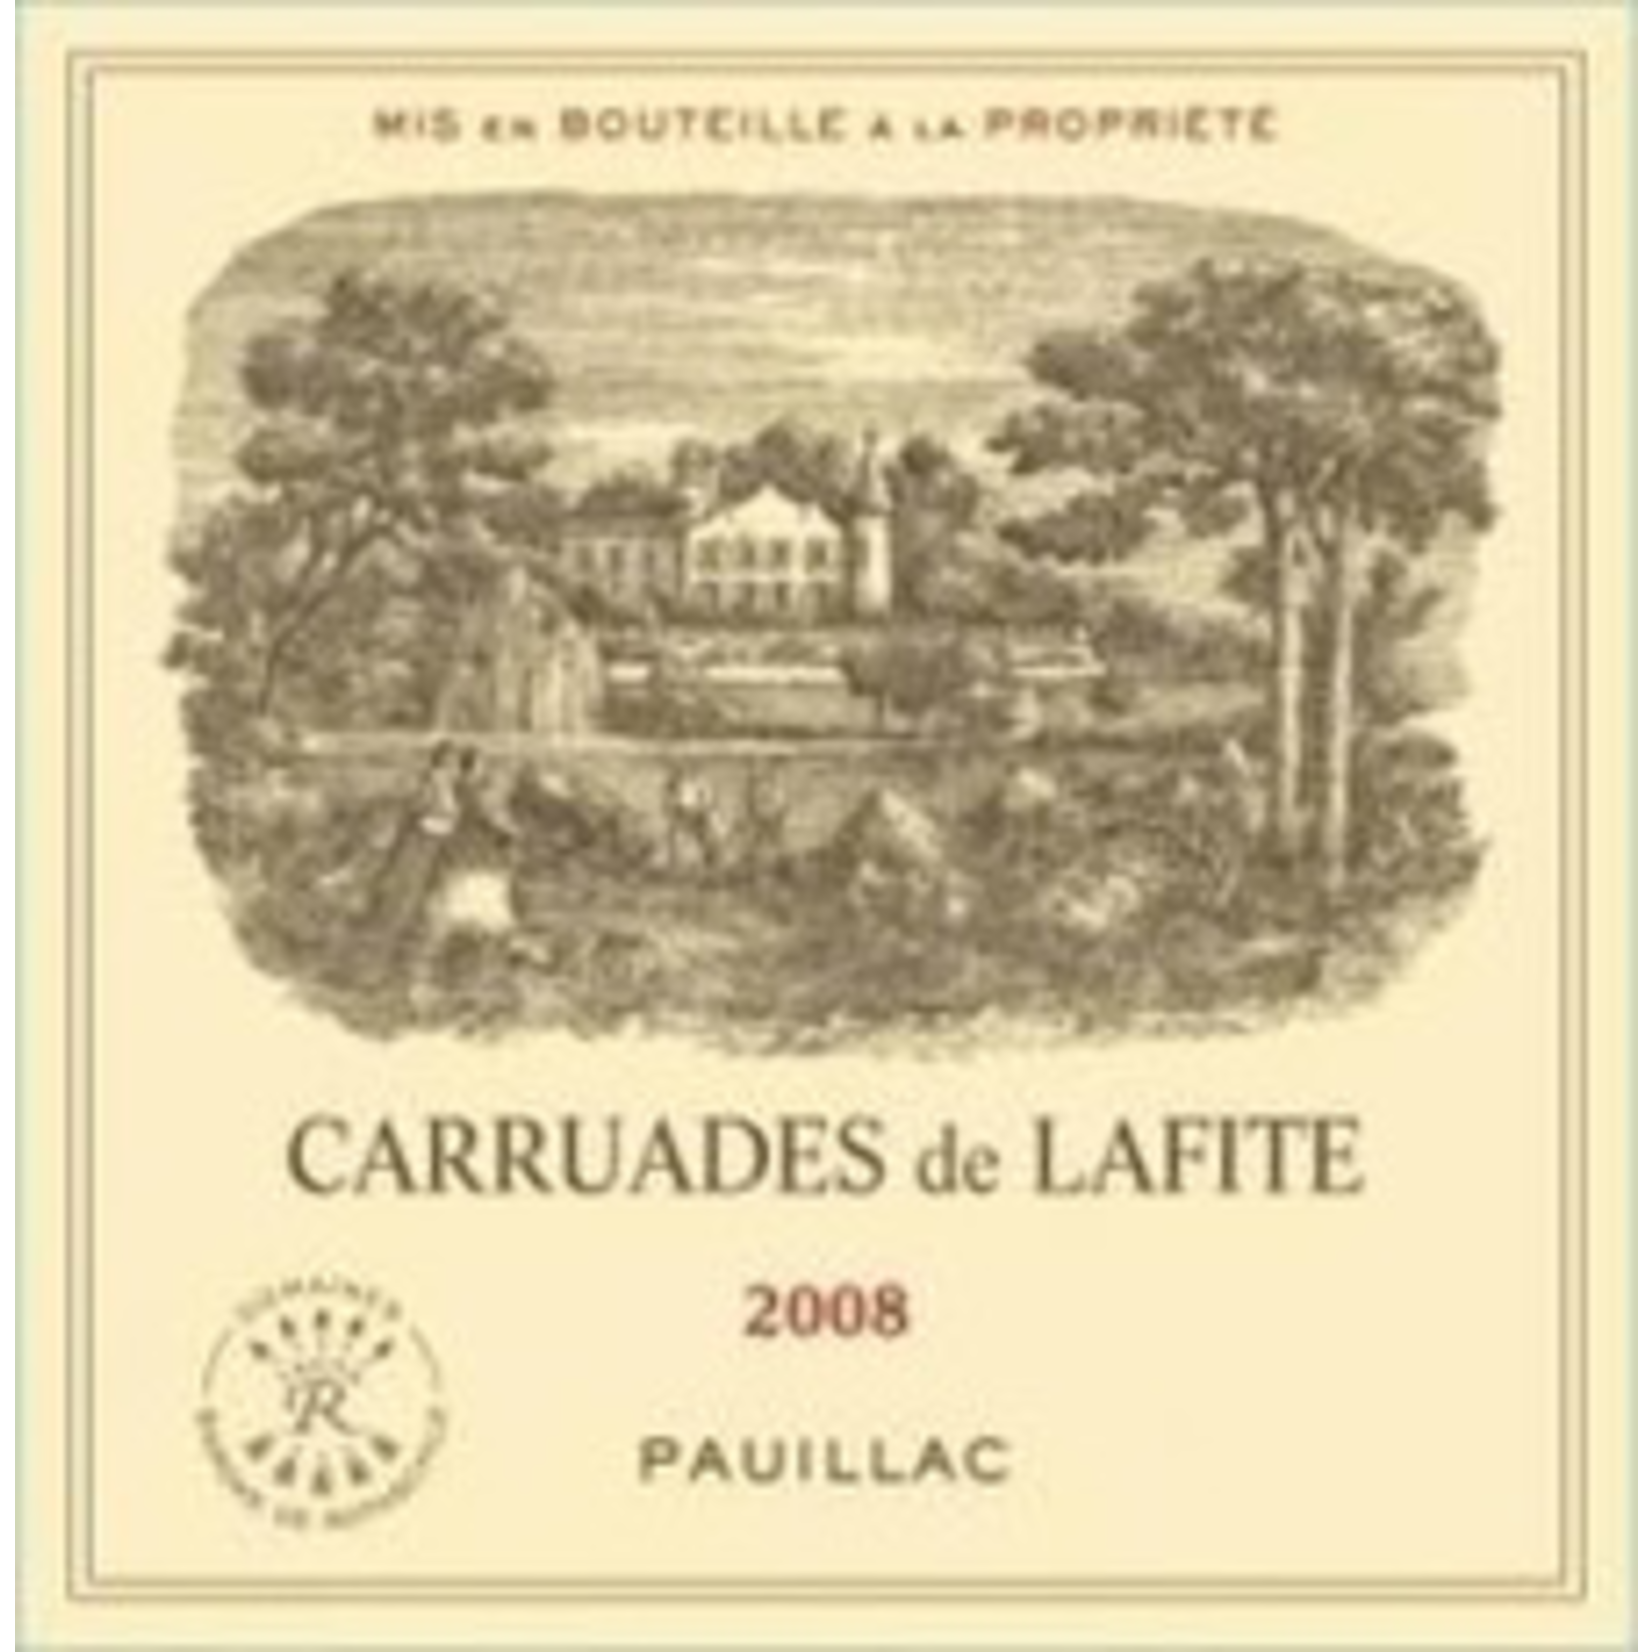 Wine Chateau Carruades de Lafite 2008